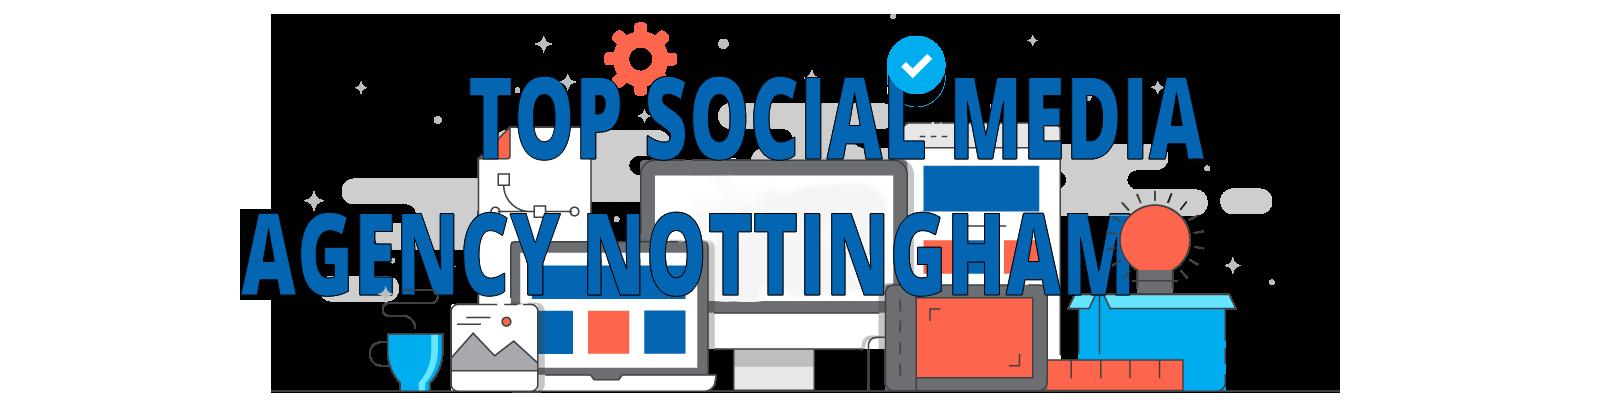 seek social top social media agency nottingham header with transparent background